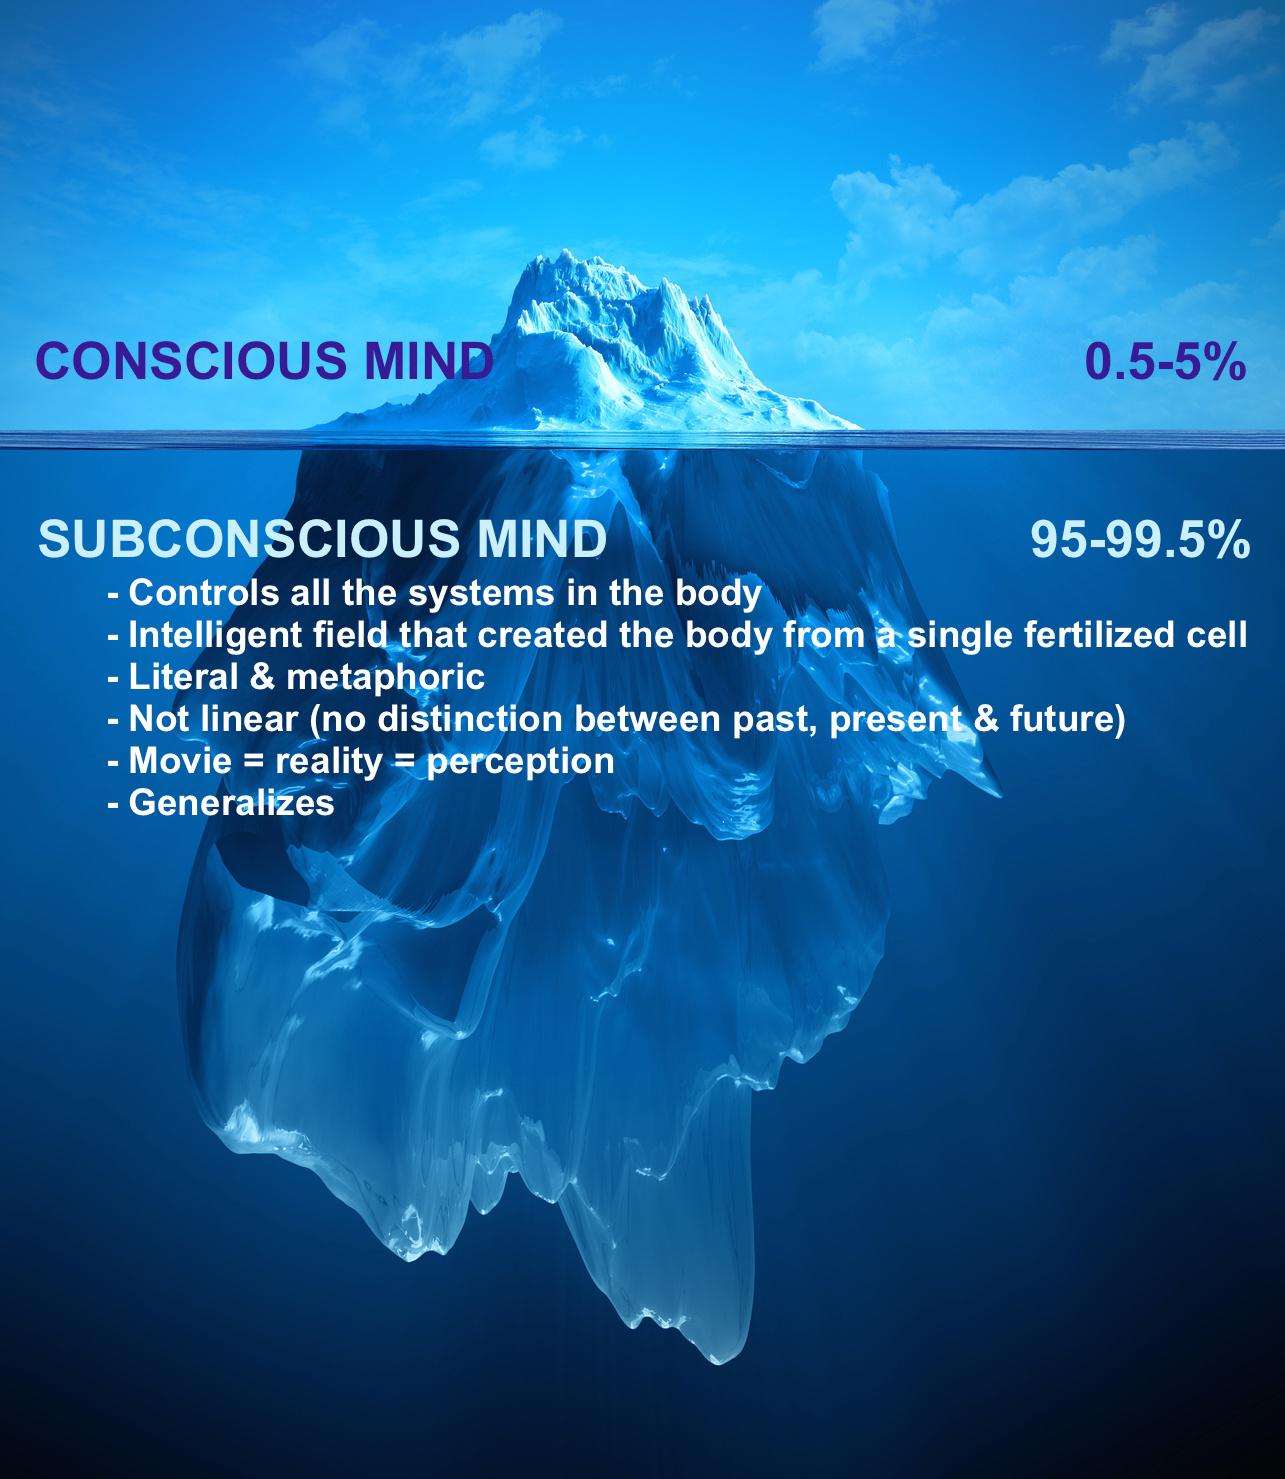 The Subconscious Mind.